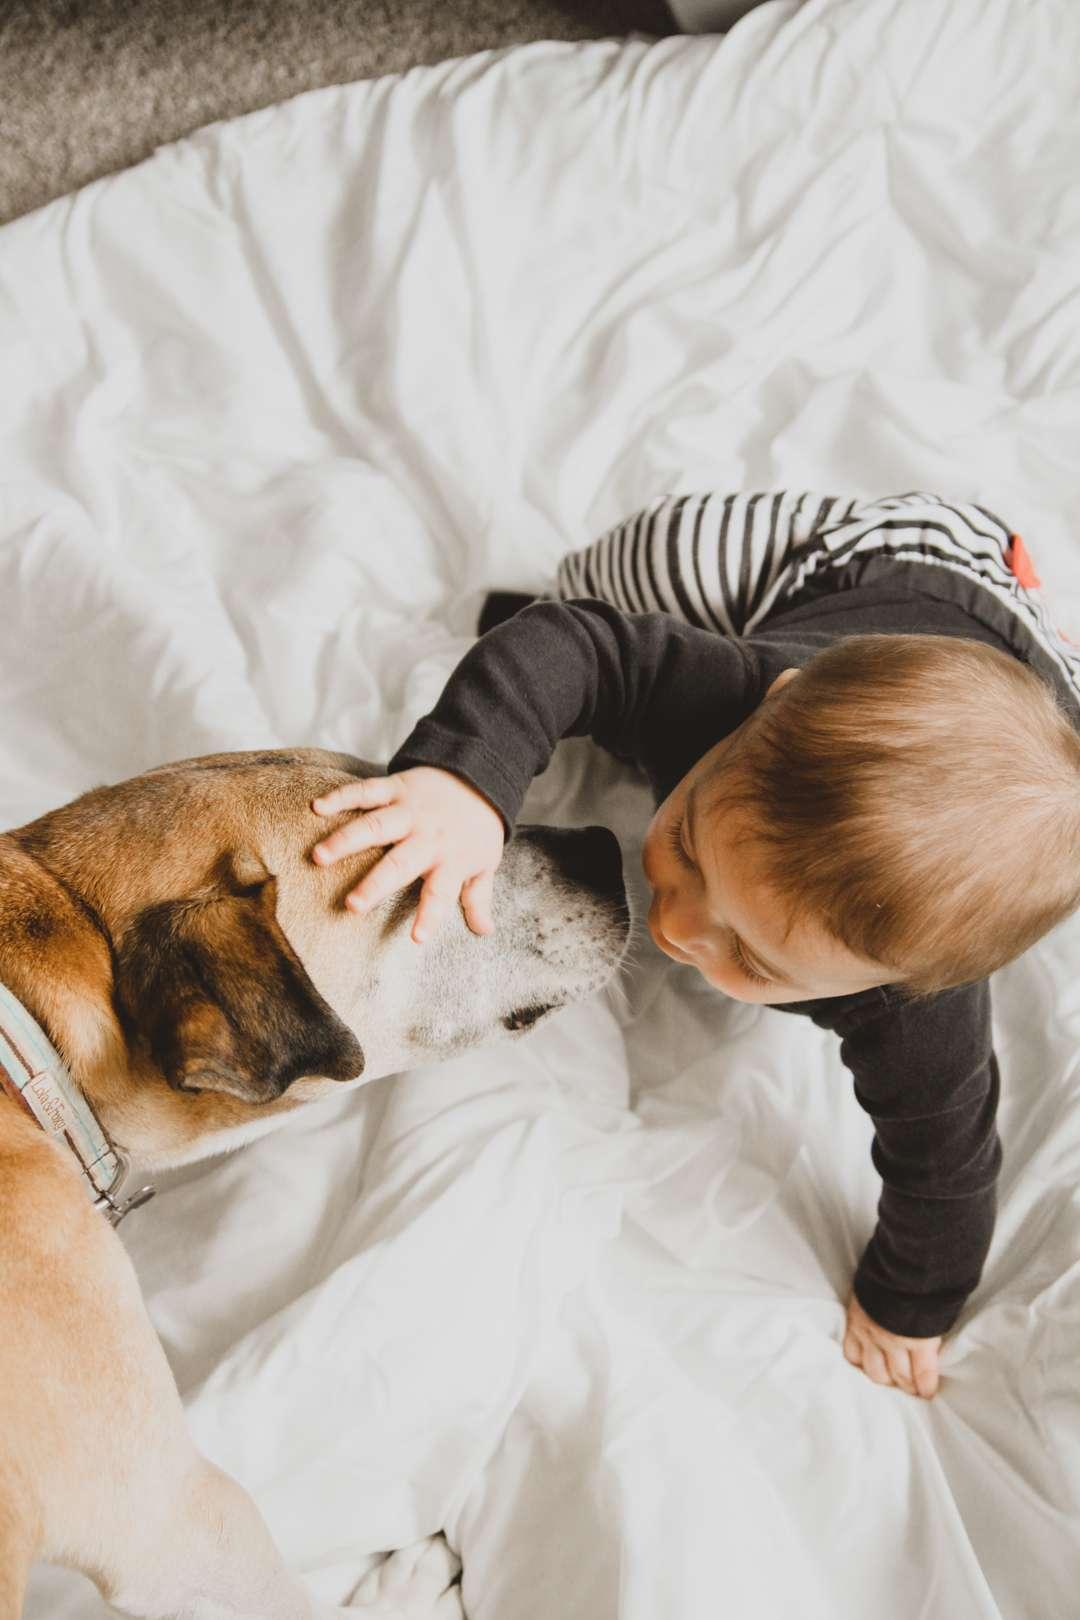 Elderly dog and baby